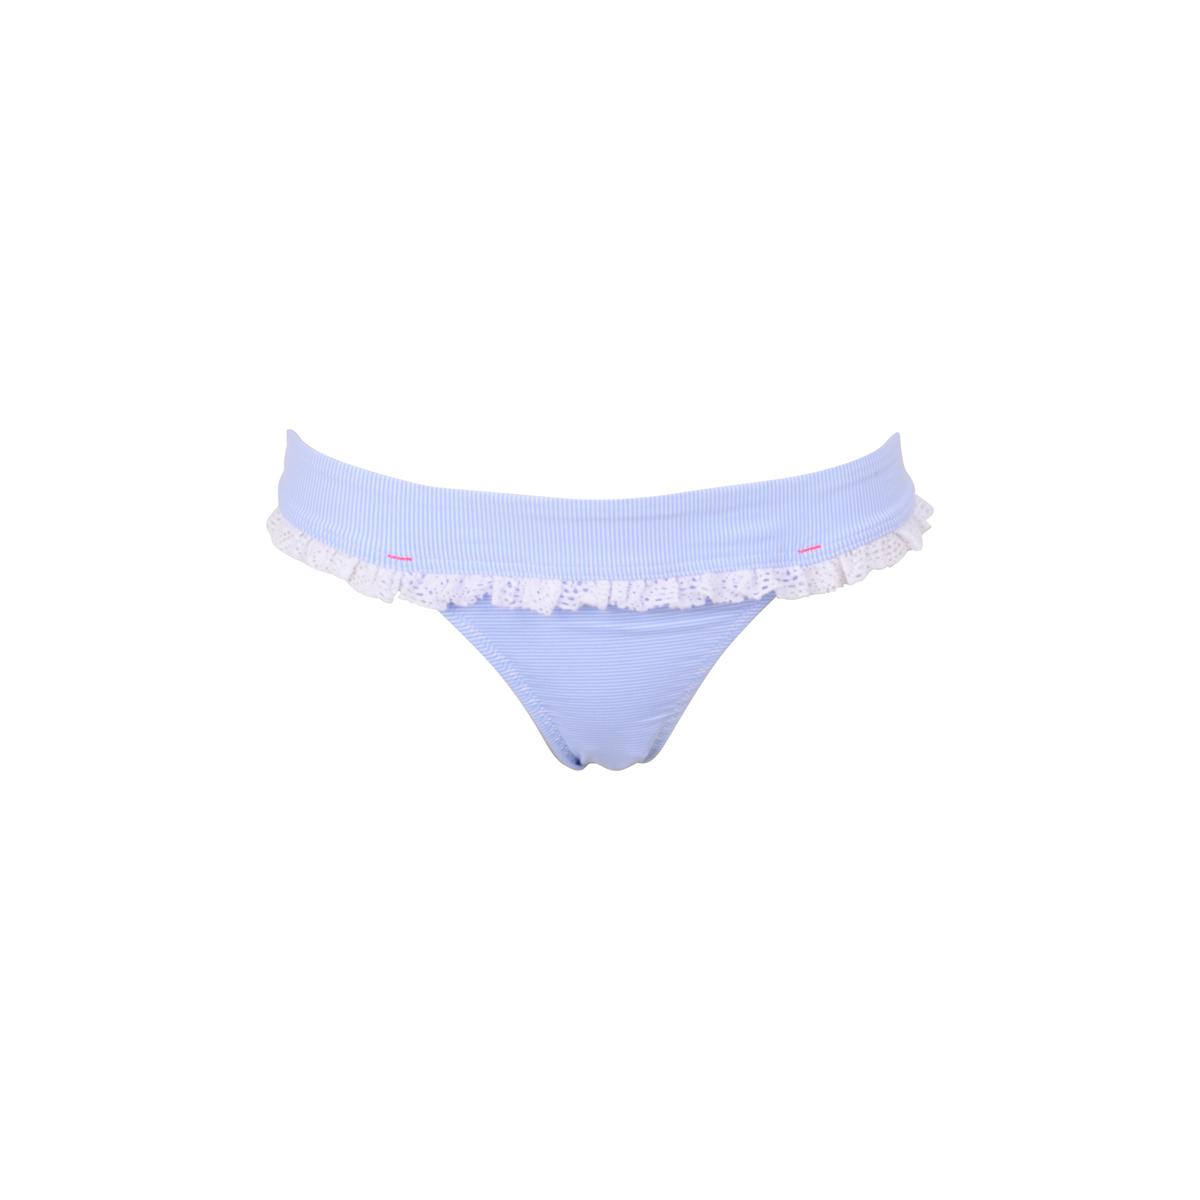 TEENS - Bikini-Slip Angelica blau-weiß gestreift (Hose)